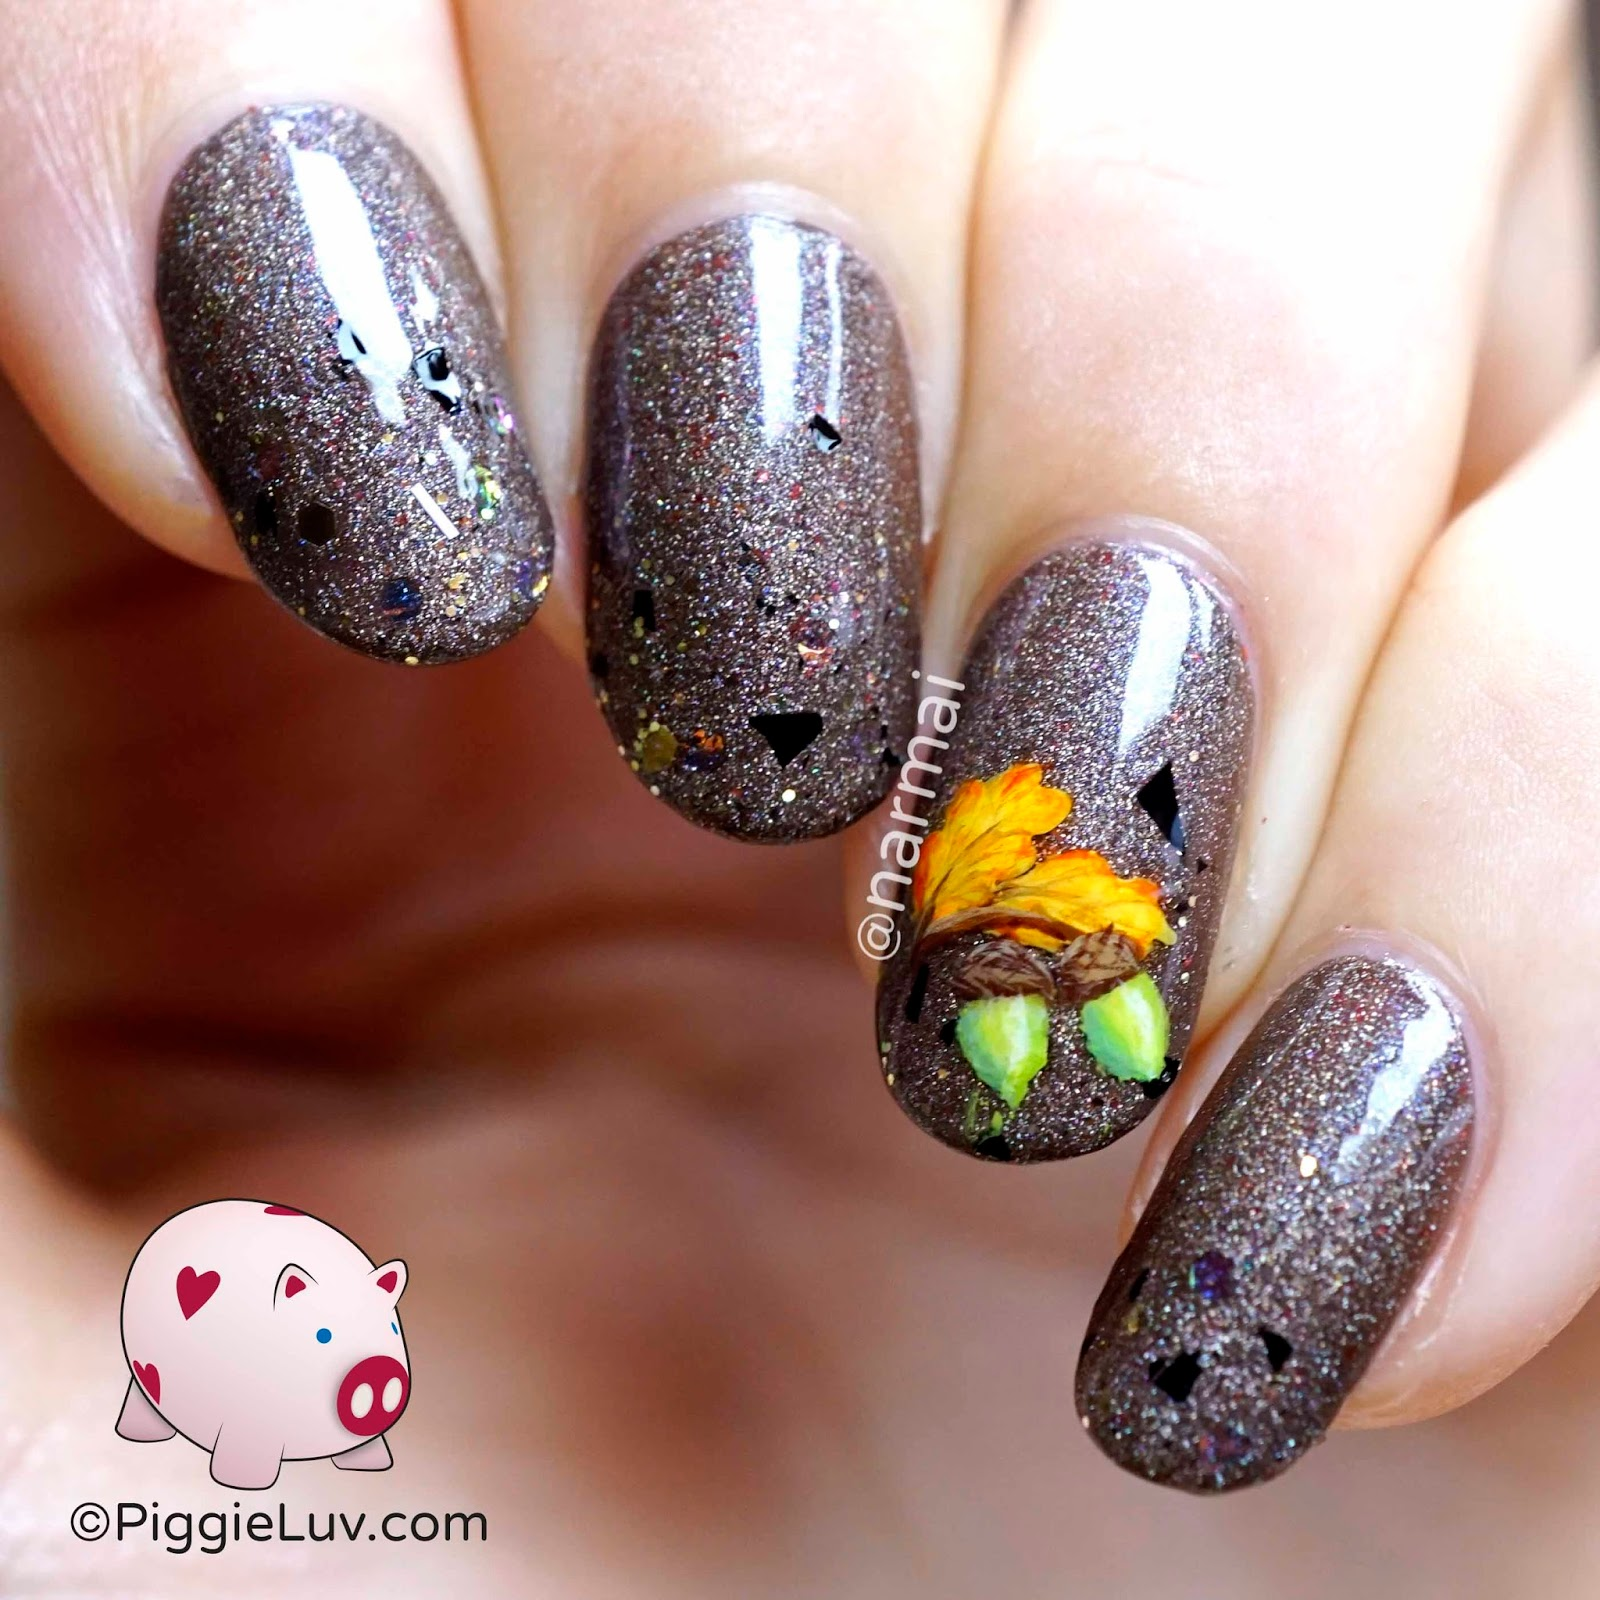 PiggieLuv: November Nail the Mail box review & nail art